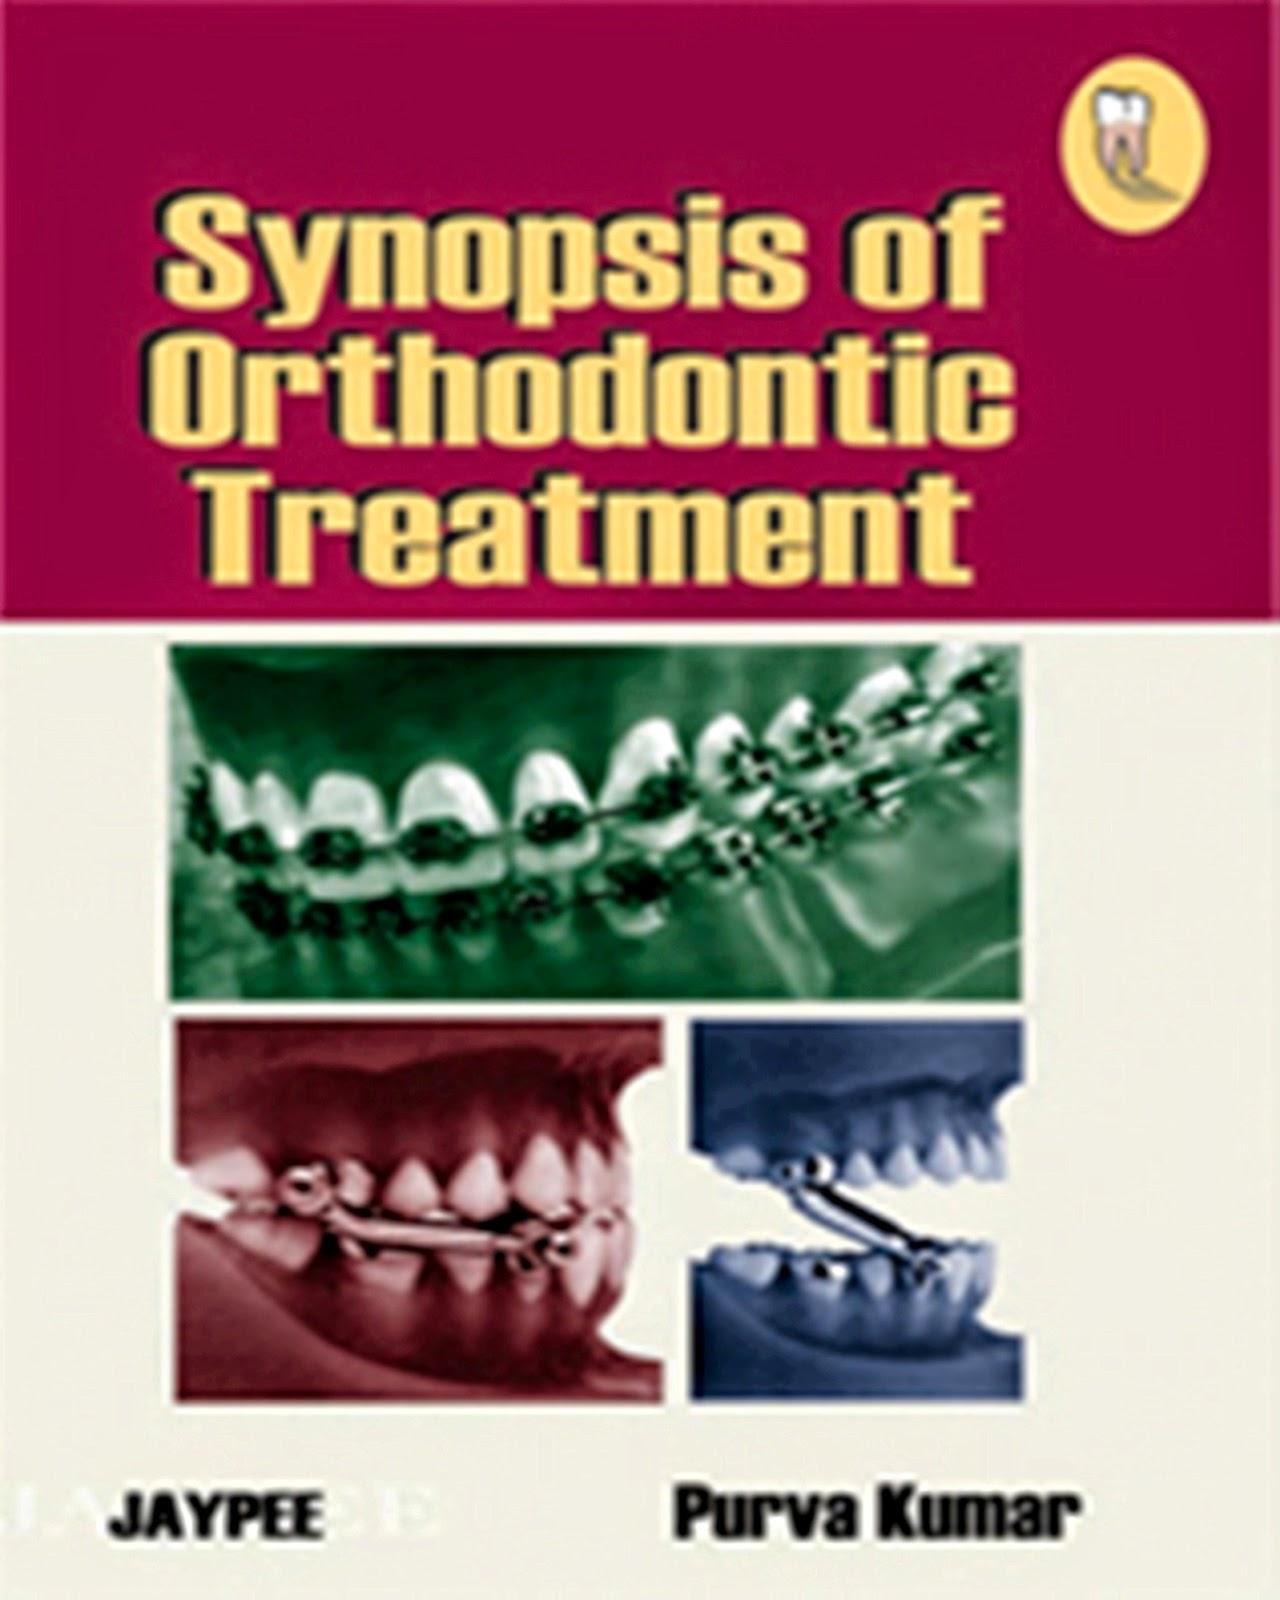 Synopsis of Orthodontic Treatment - Purva Kumar - © 2007.PDF